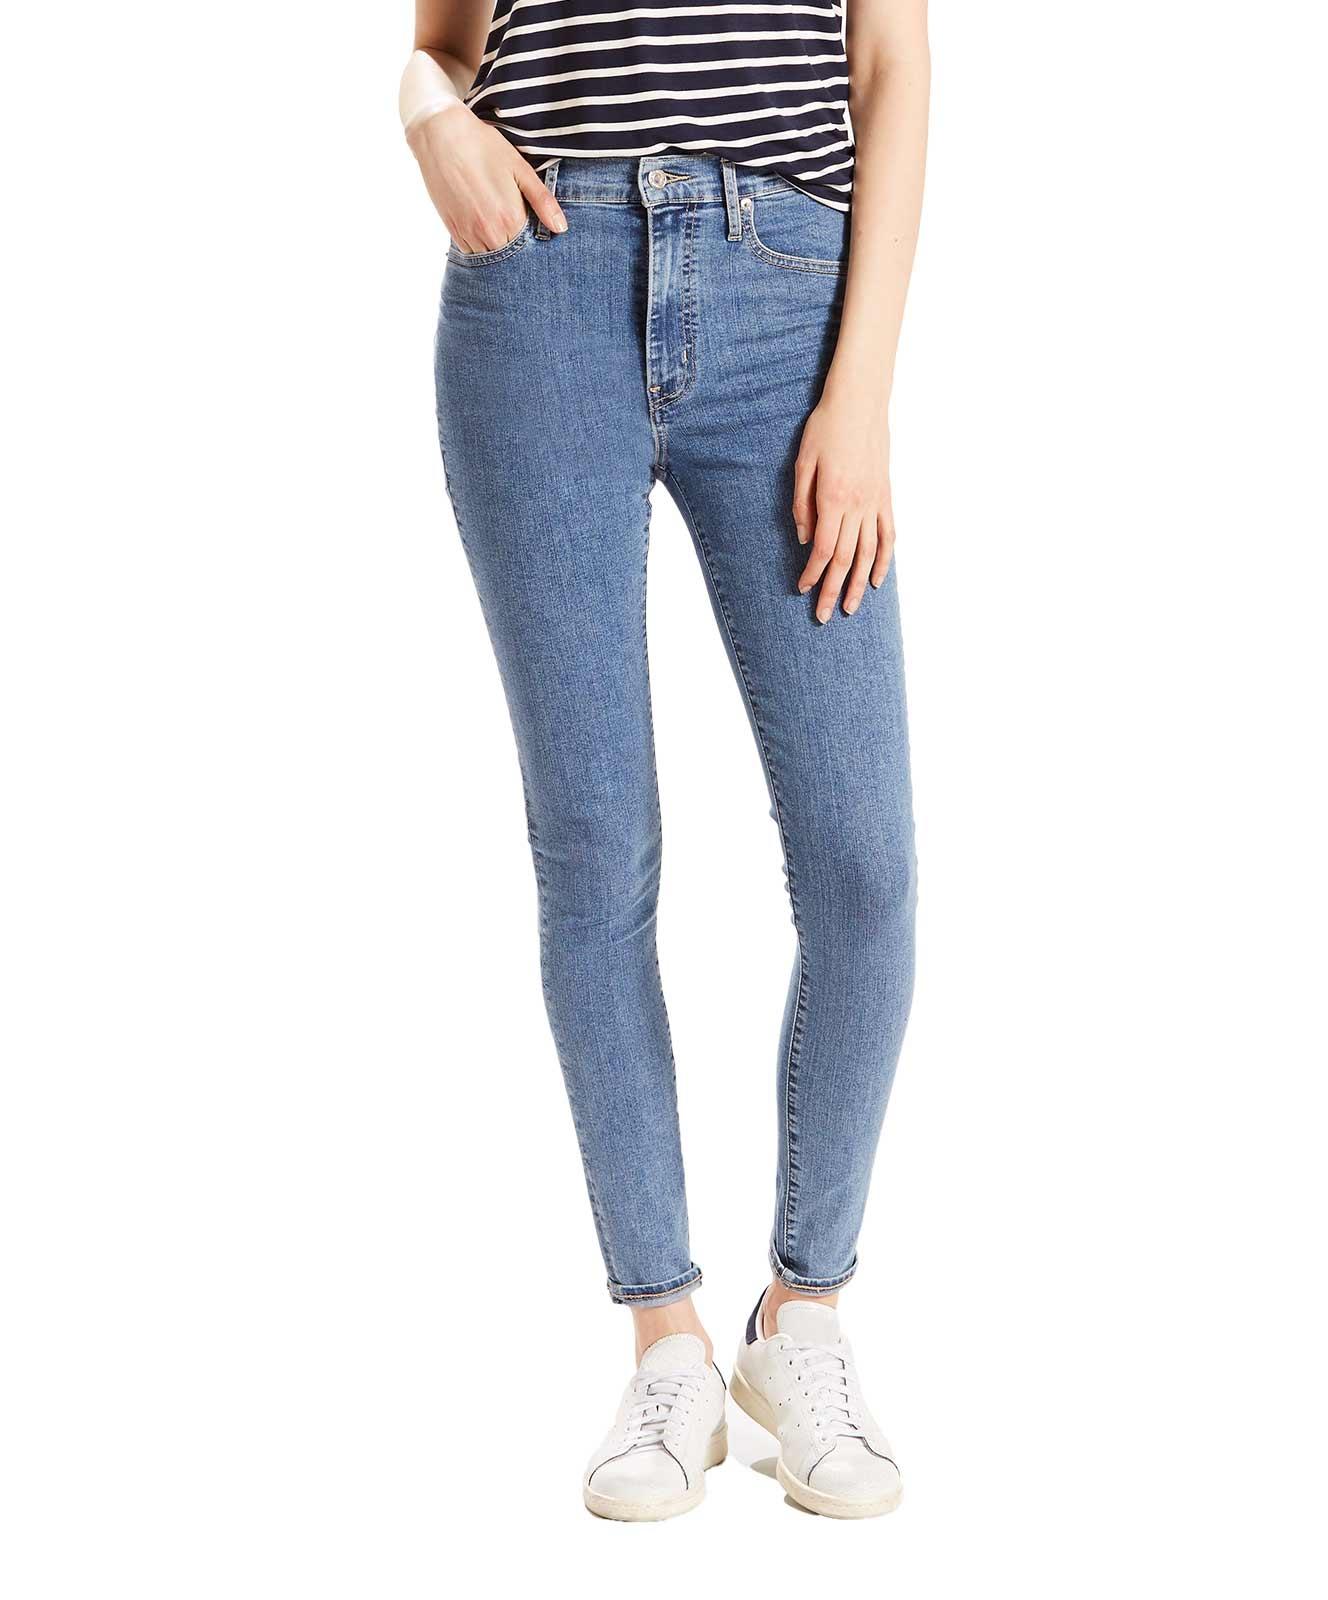 Hosen für Frauen - LEVI'S Mile High Super Skinny Jeans Cast Away  - Onlineshop Jeans Meile